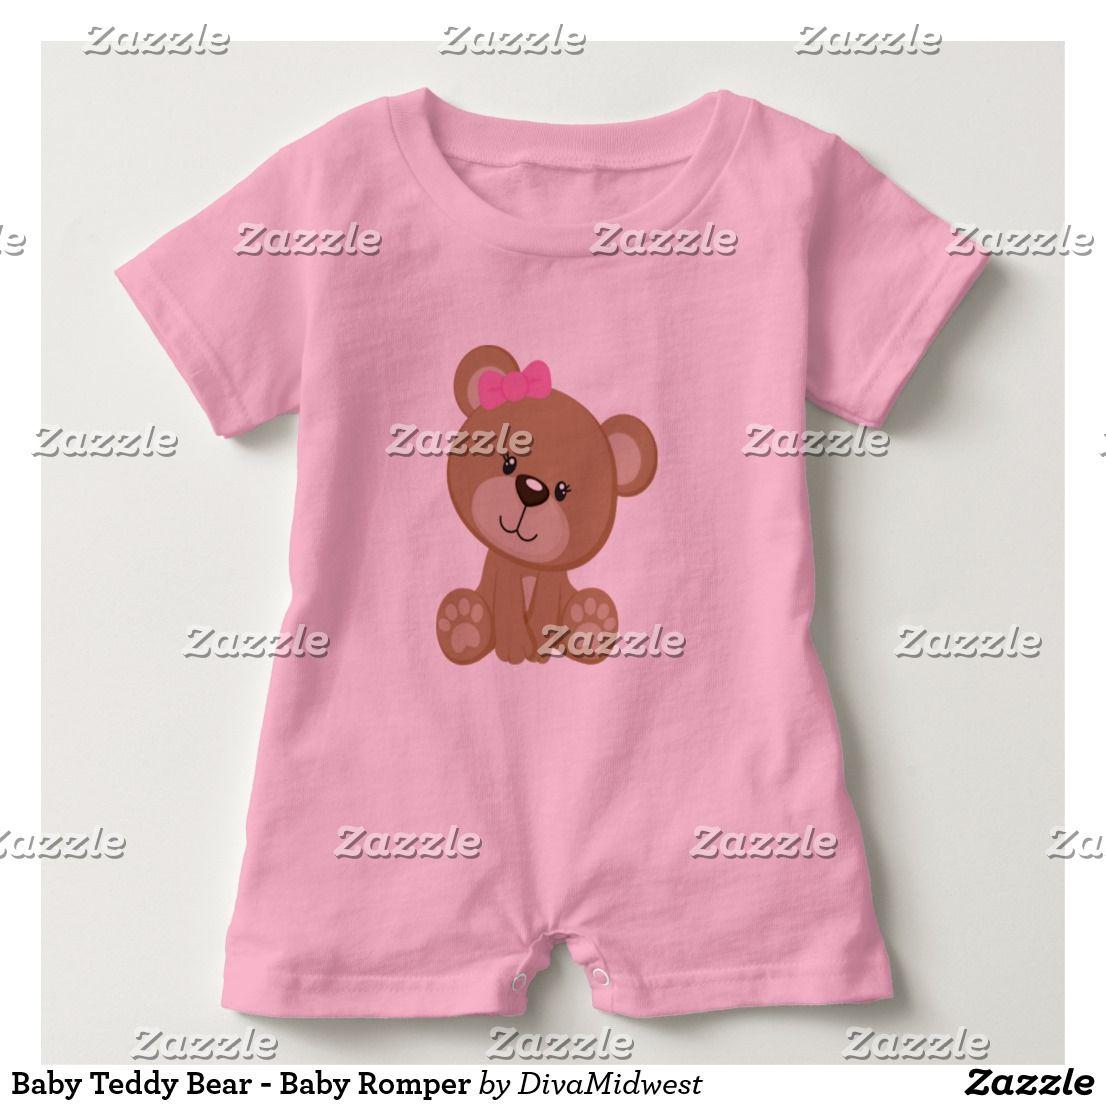 3290ecef1e9 Baby Teddy Bear - Baby Romper